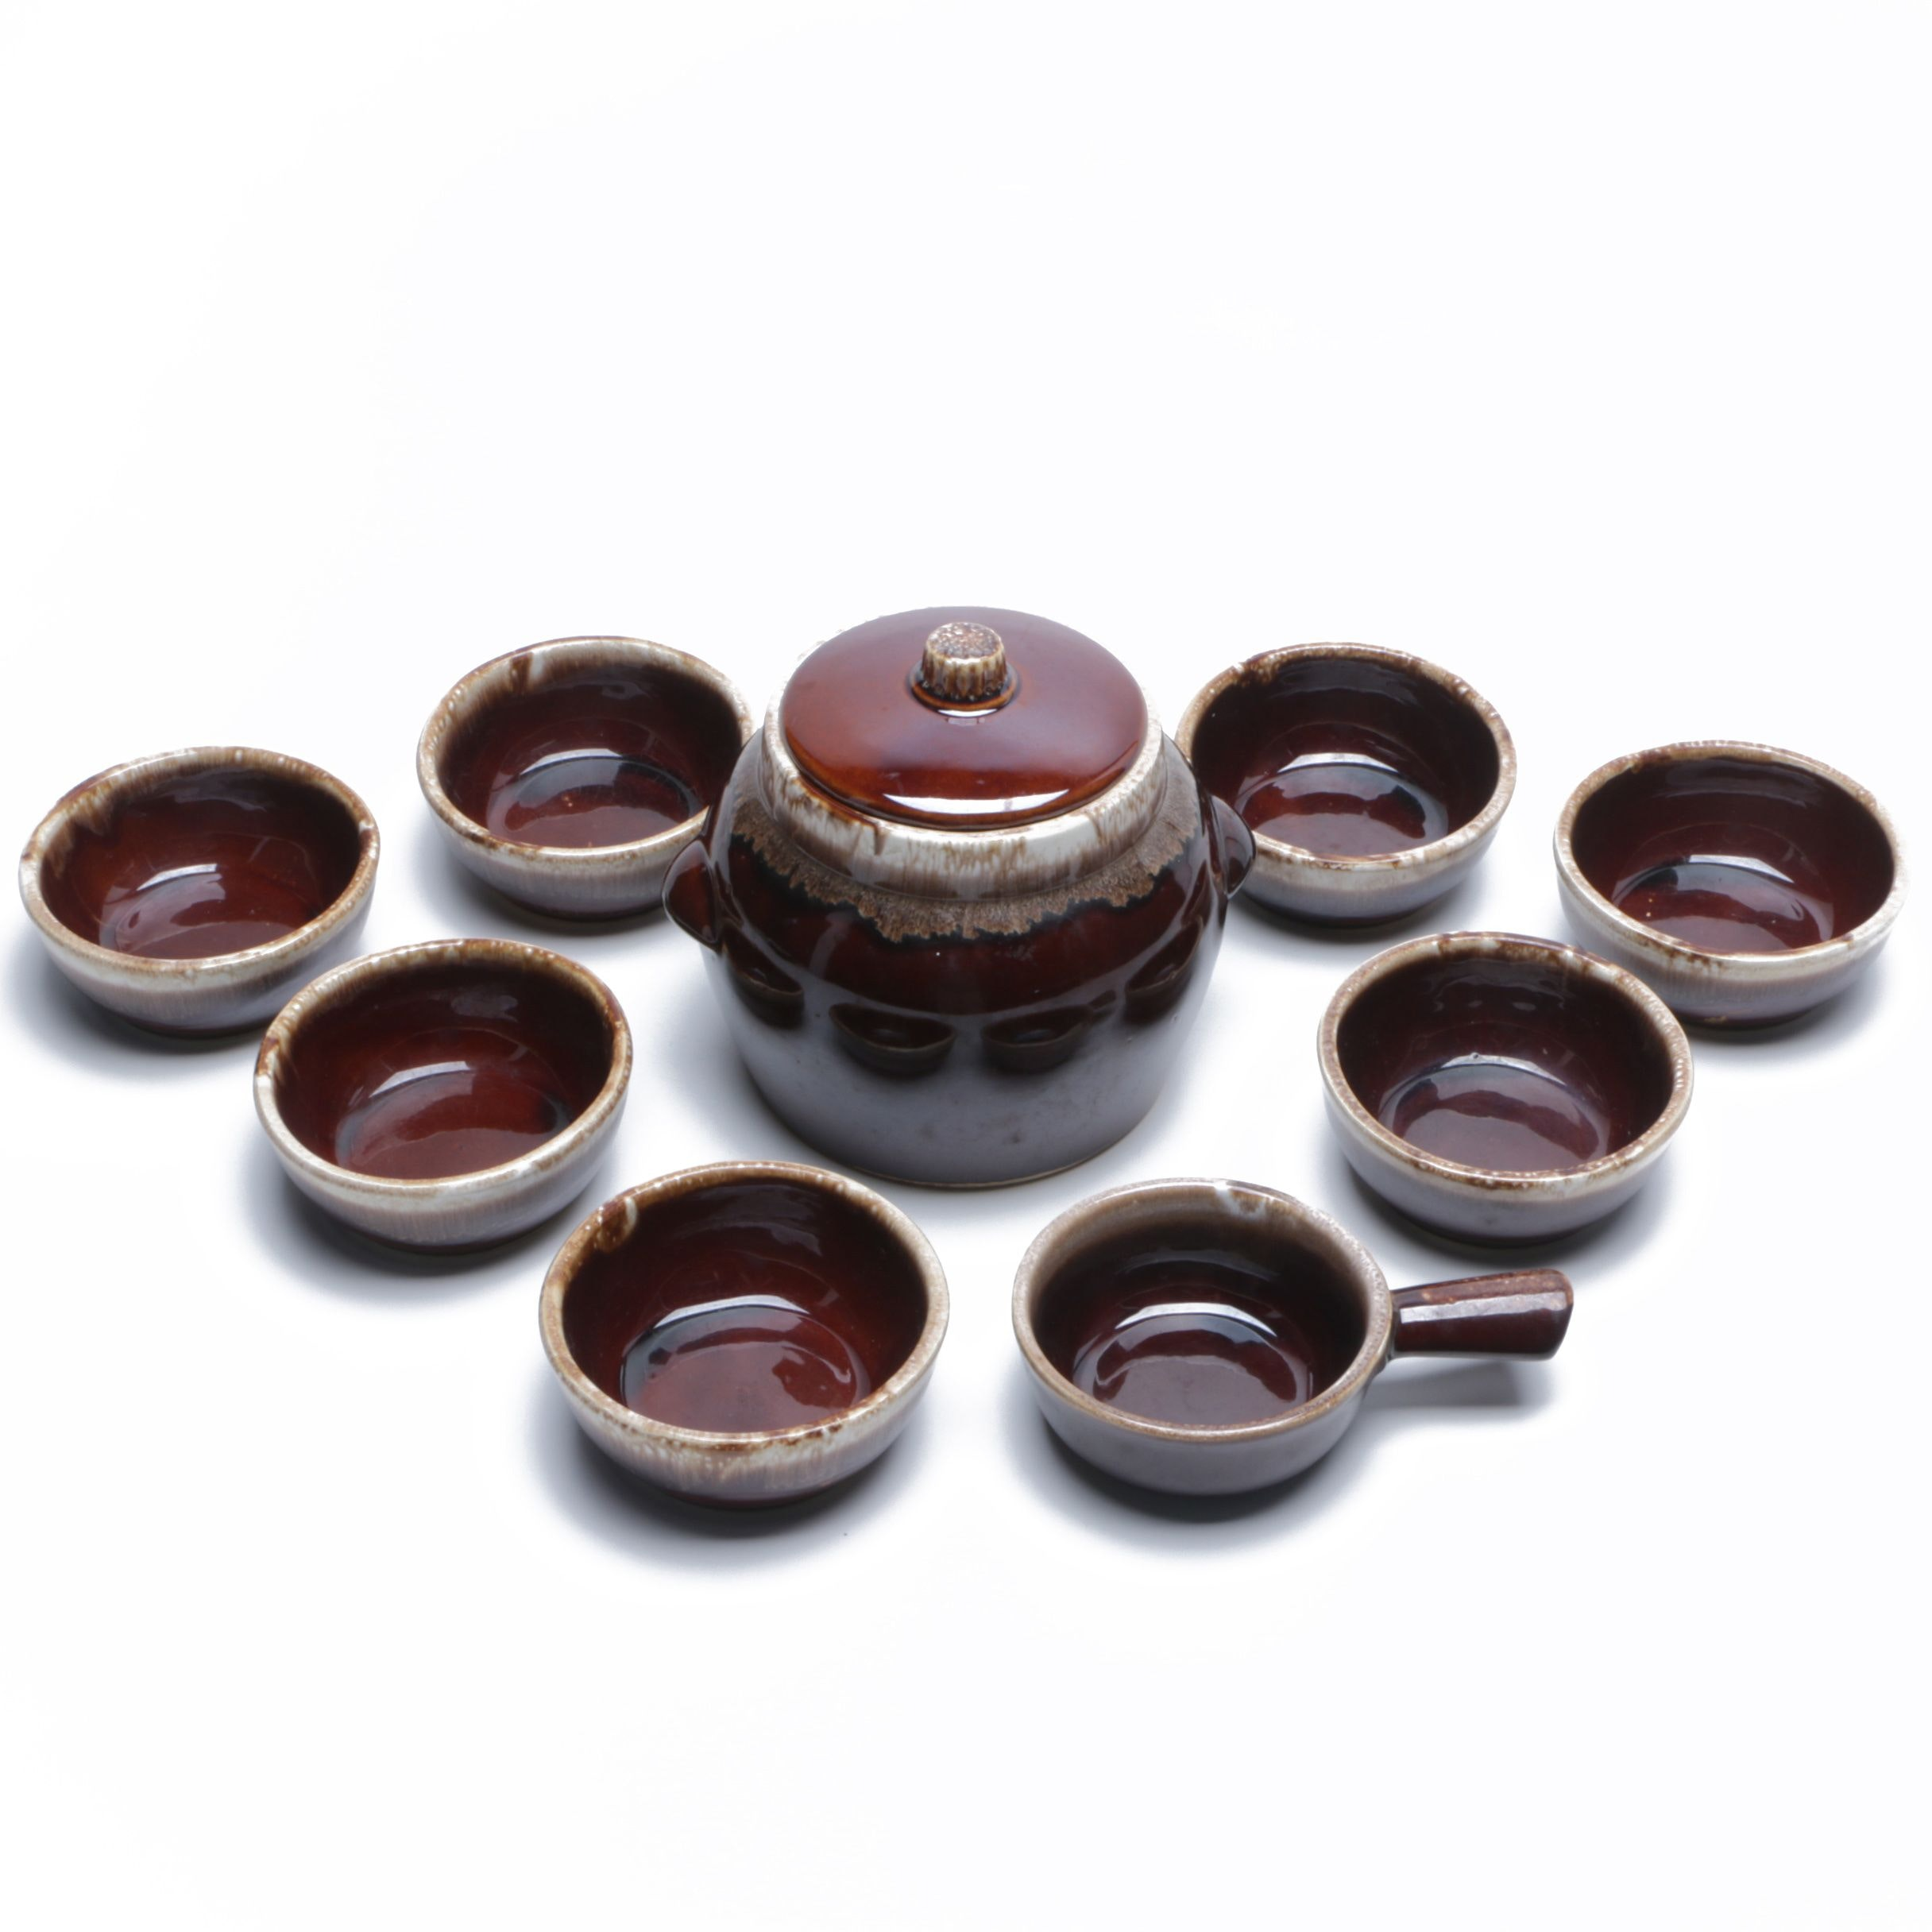 "McCoy Pottery ""Brown Drip"" Stoneware Bowls and Kathy Kale Bean Pot"